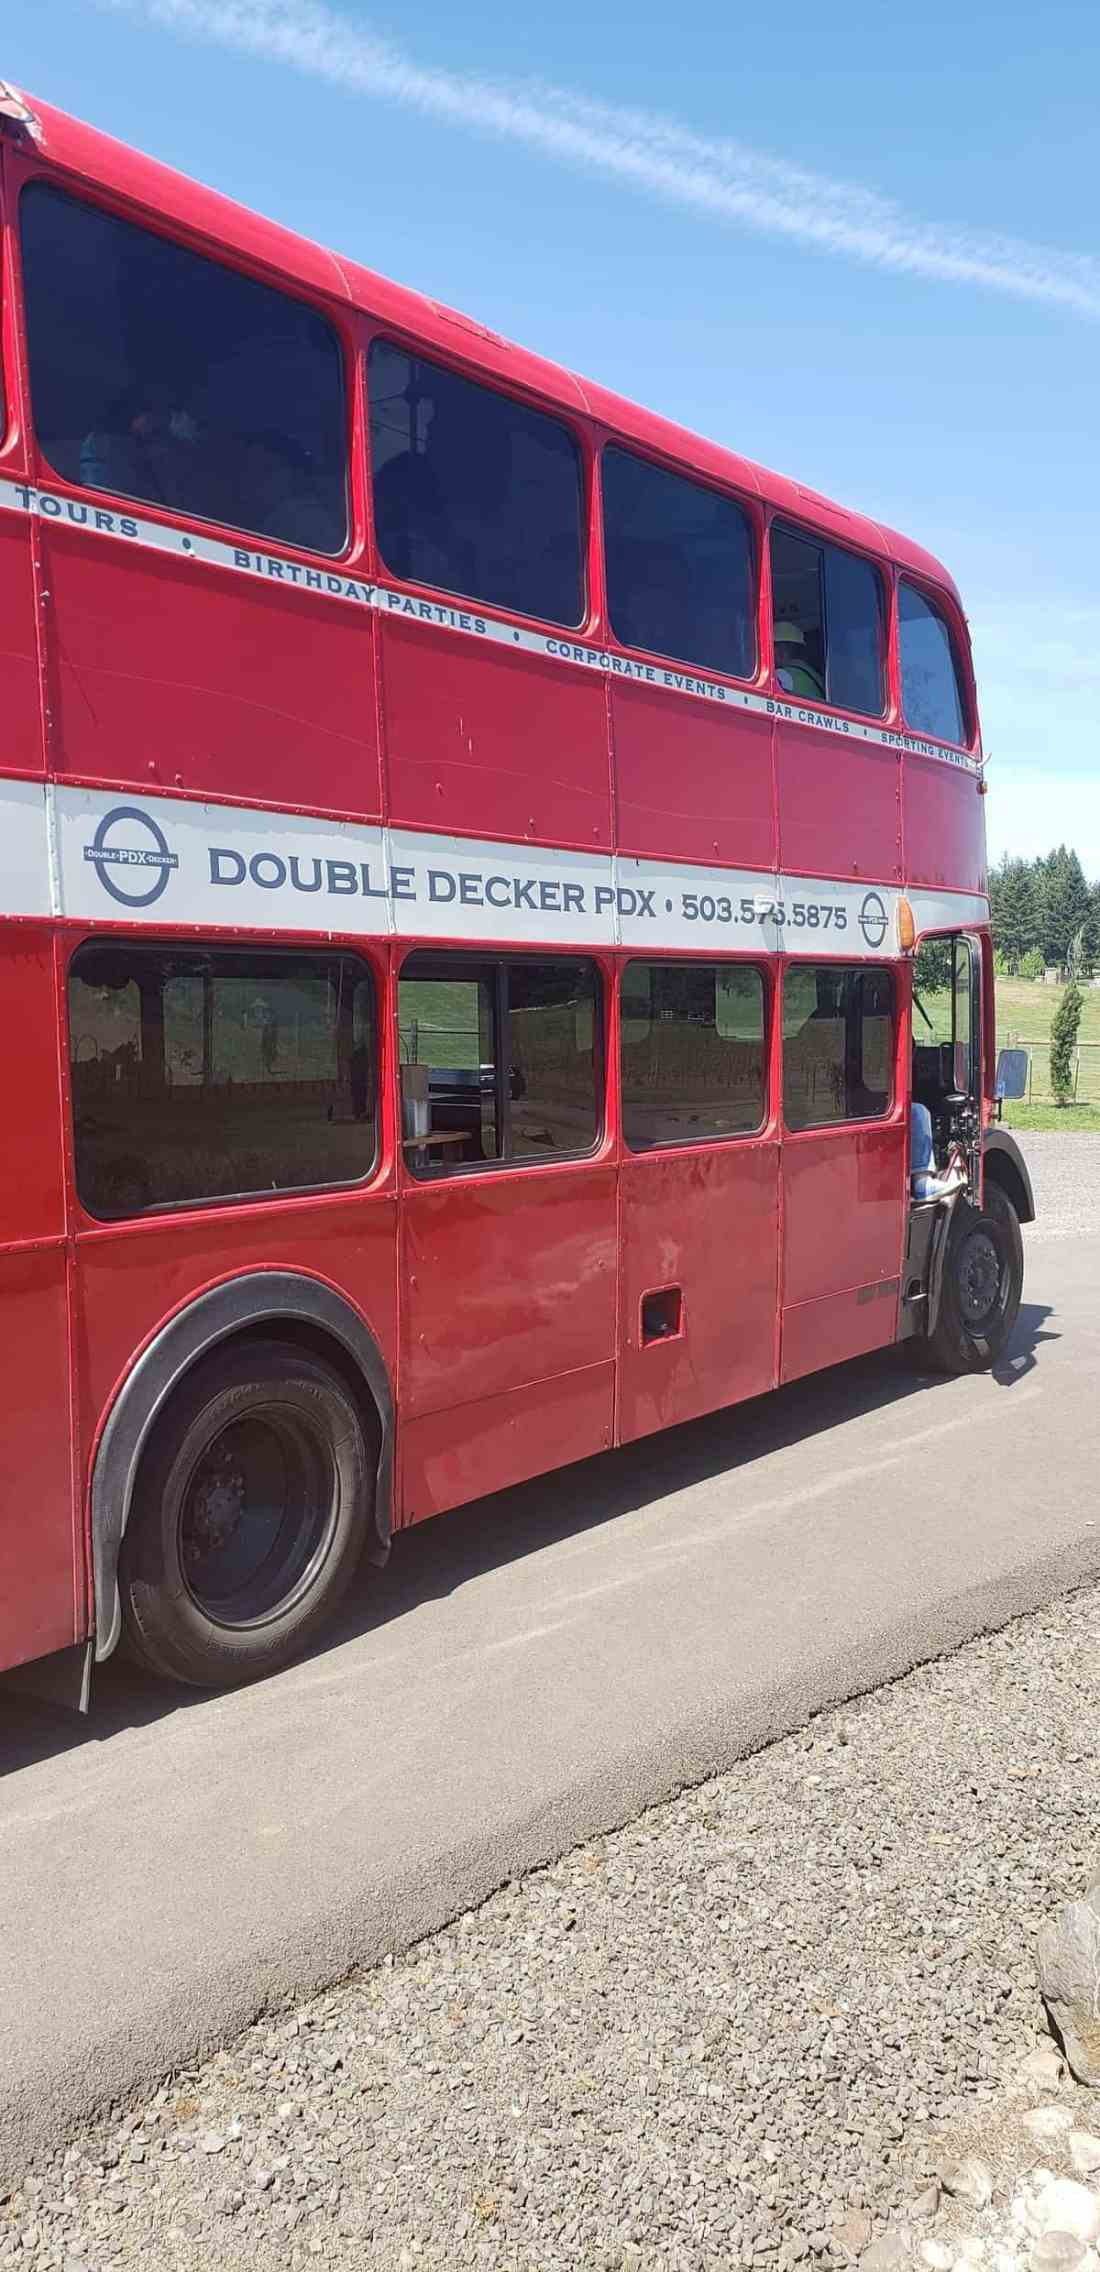 Double Decker PDX